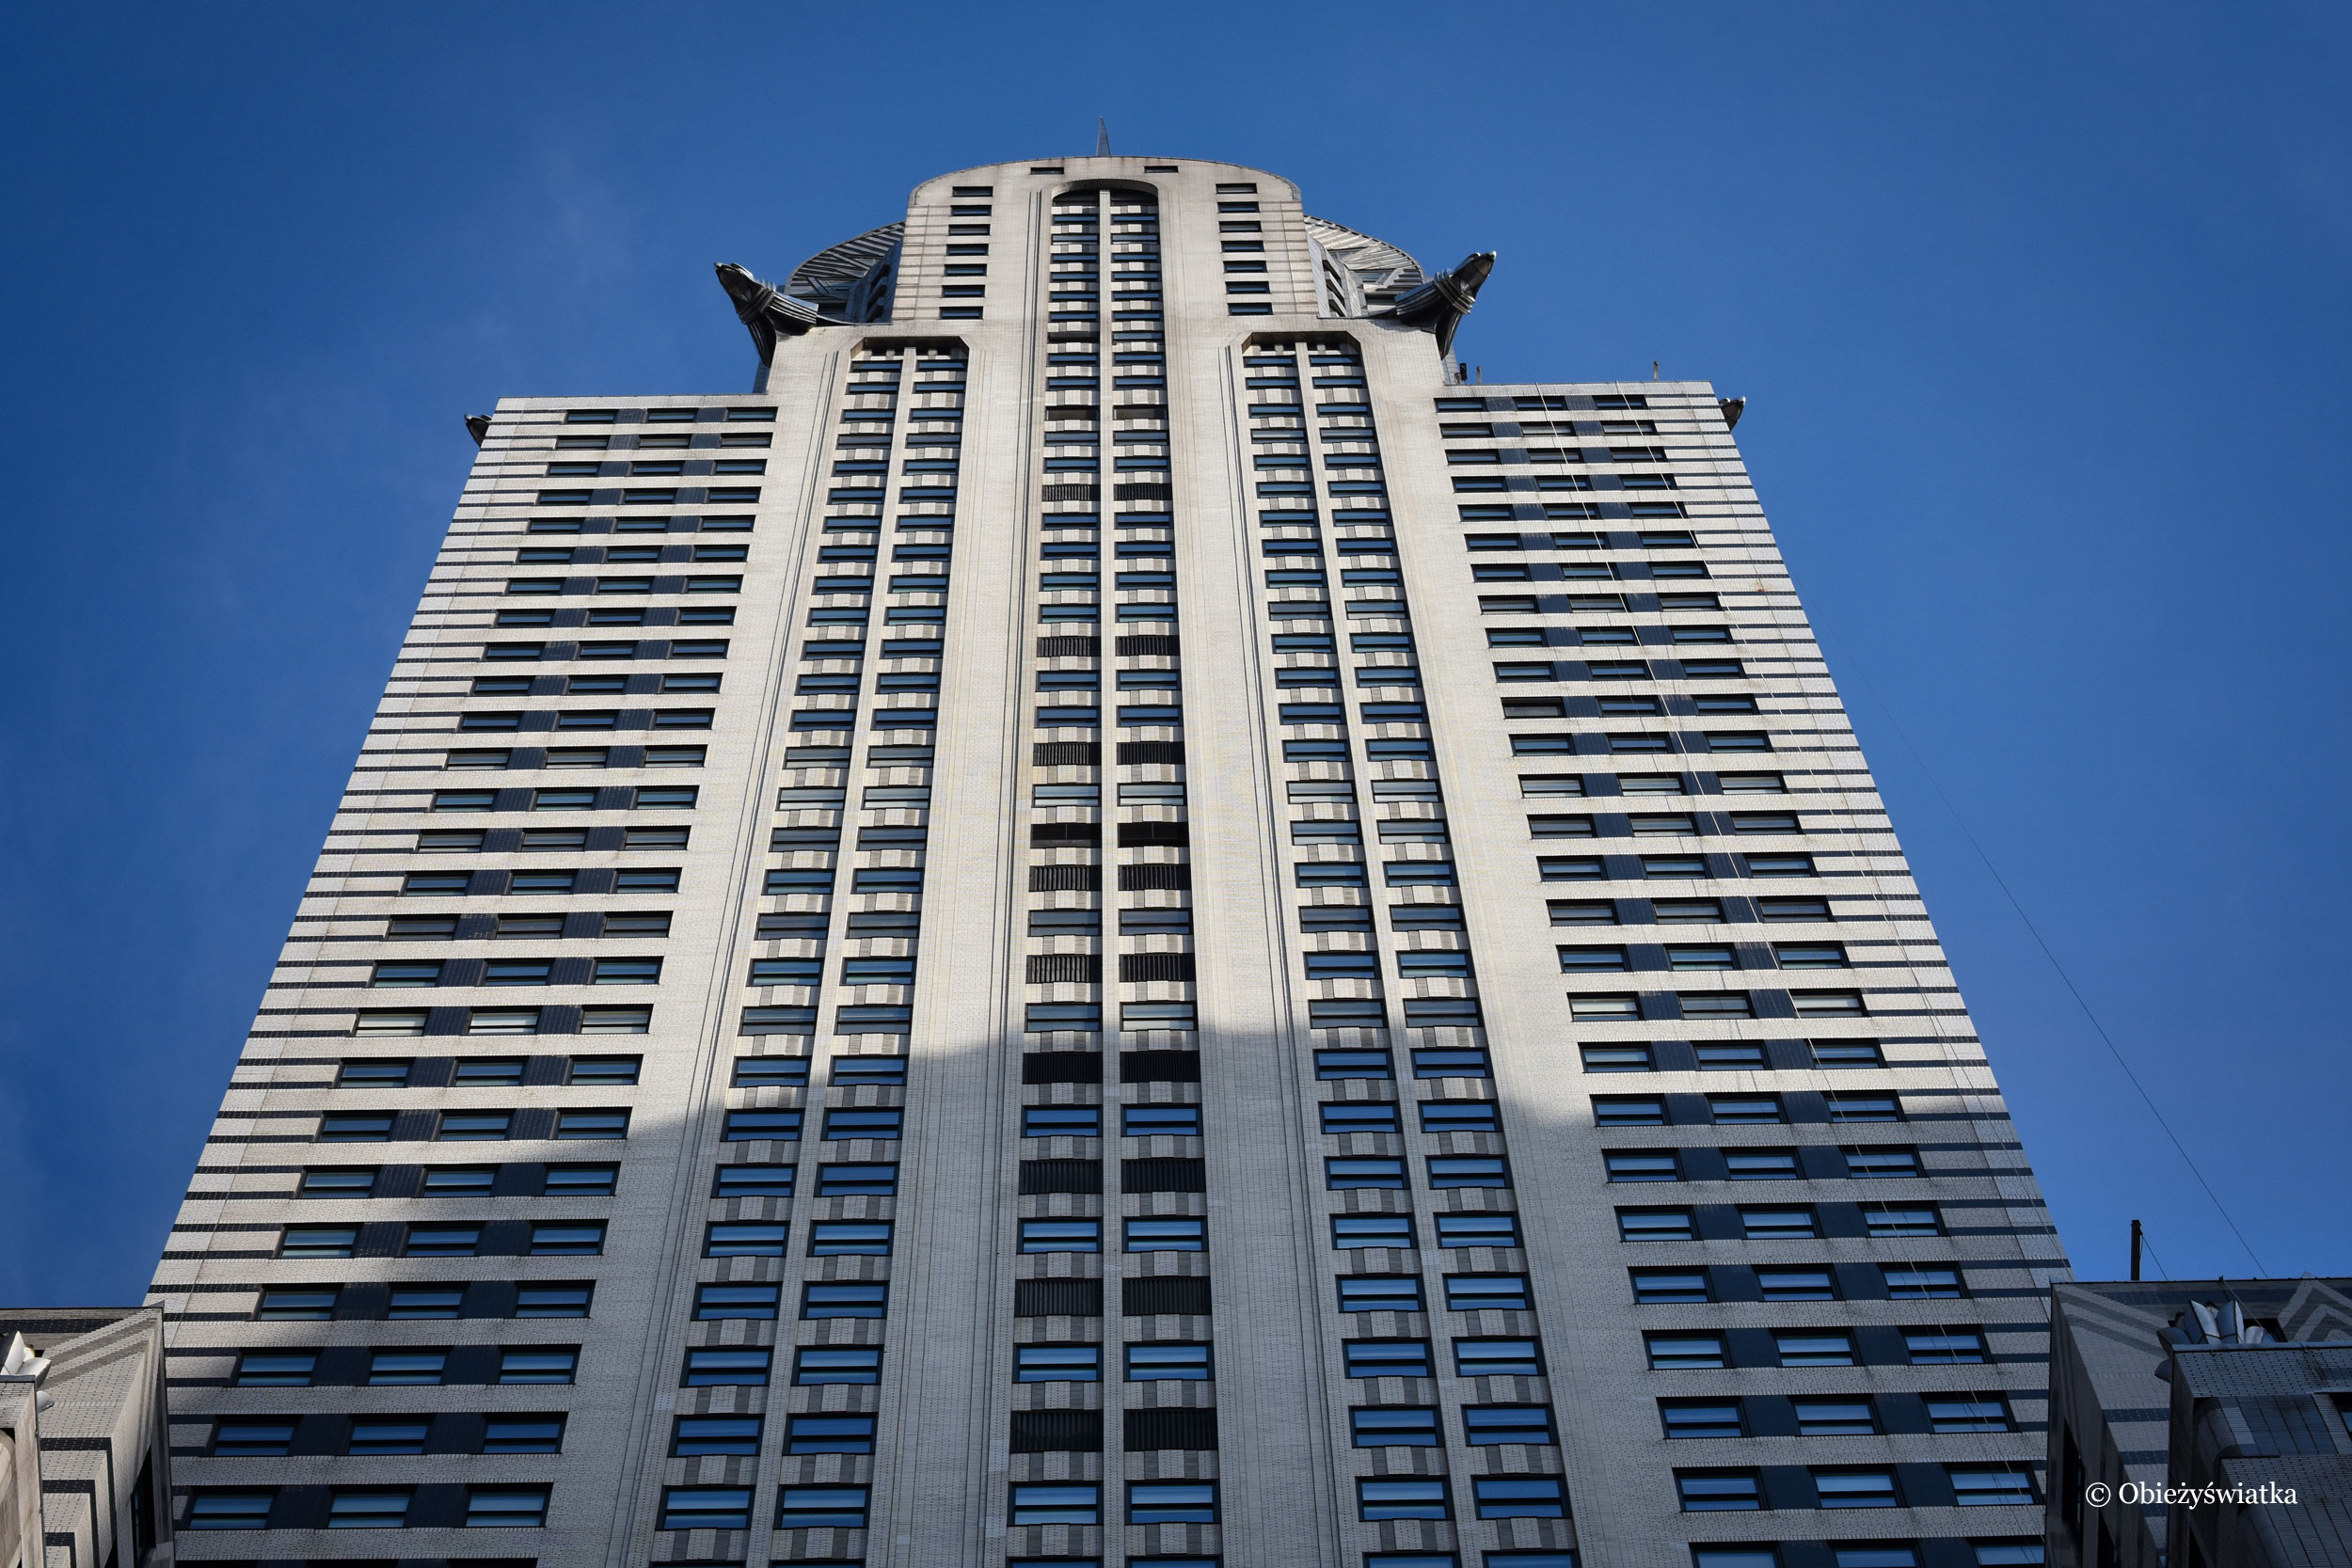 Chrysler Building i jego gargulce, Nowy Jork